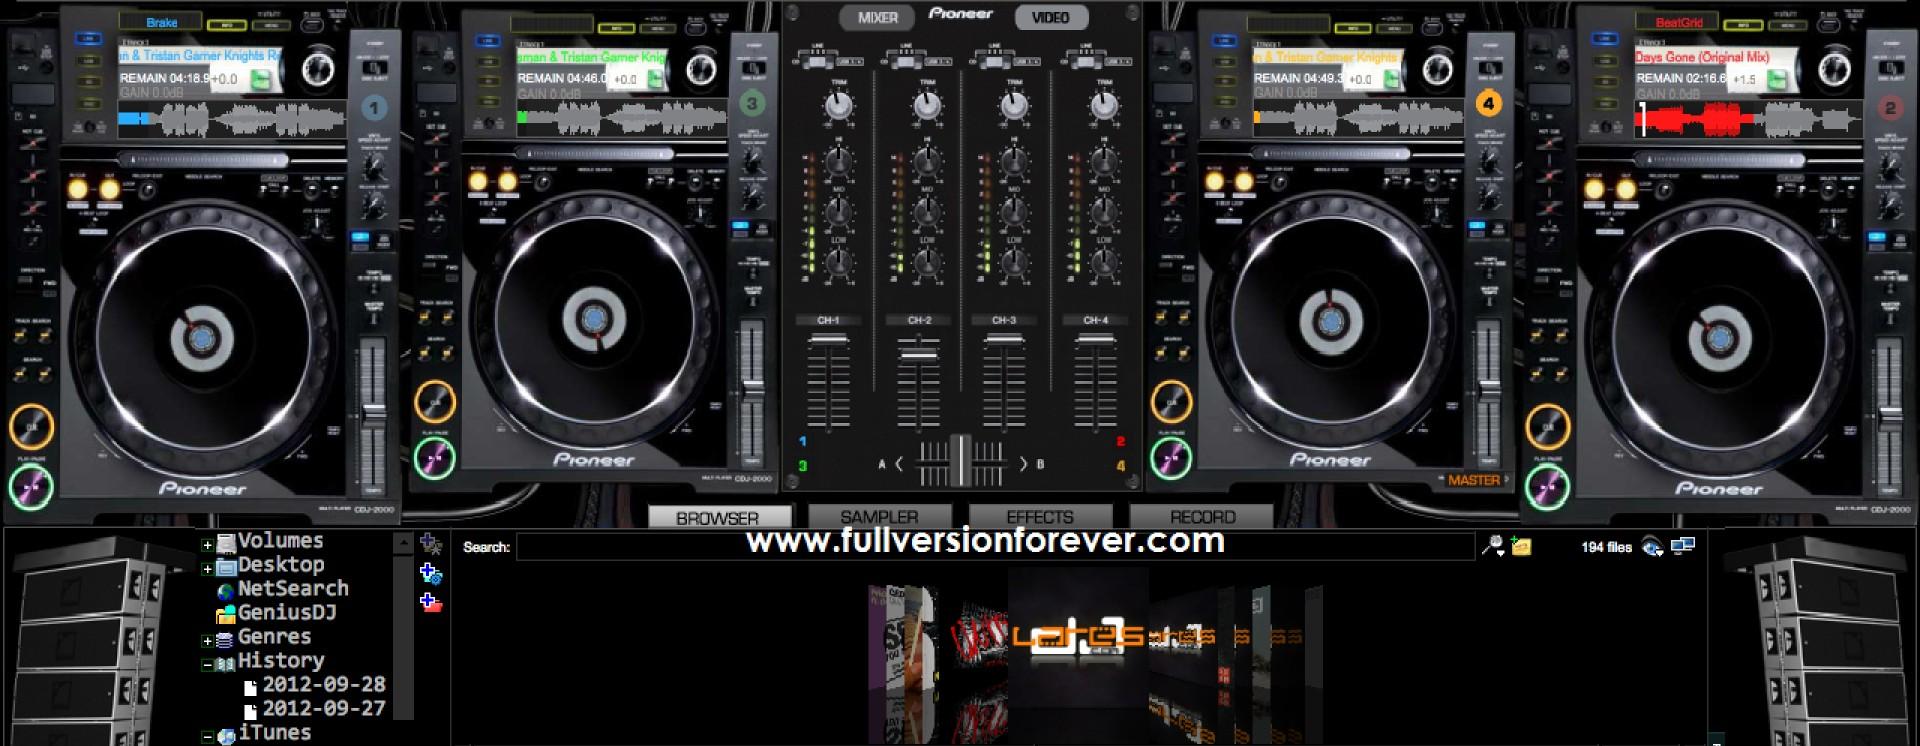 V'Dj- Kimak-music-dj | ReverbNation